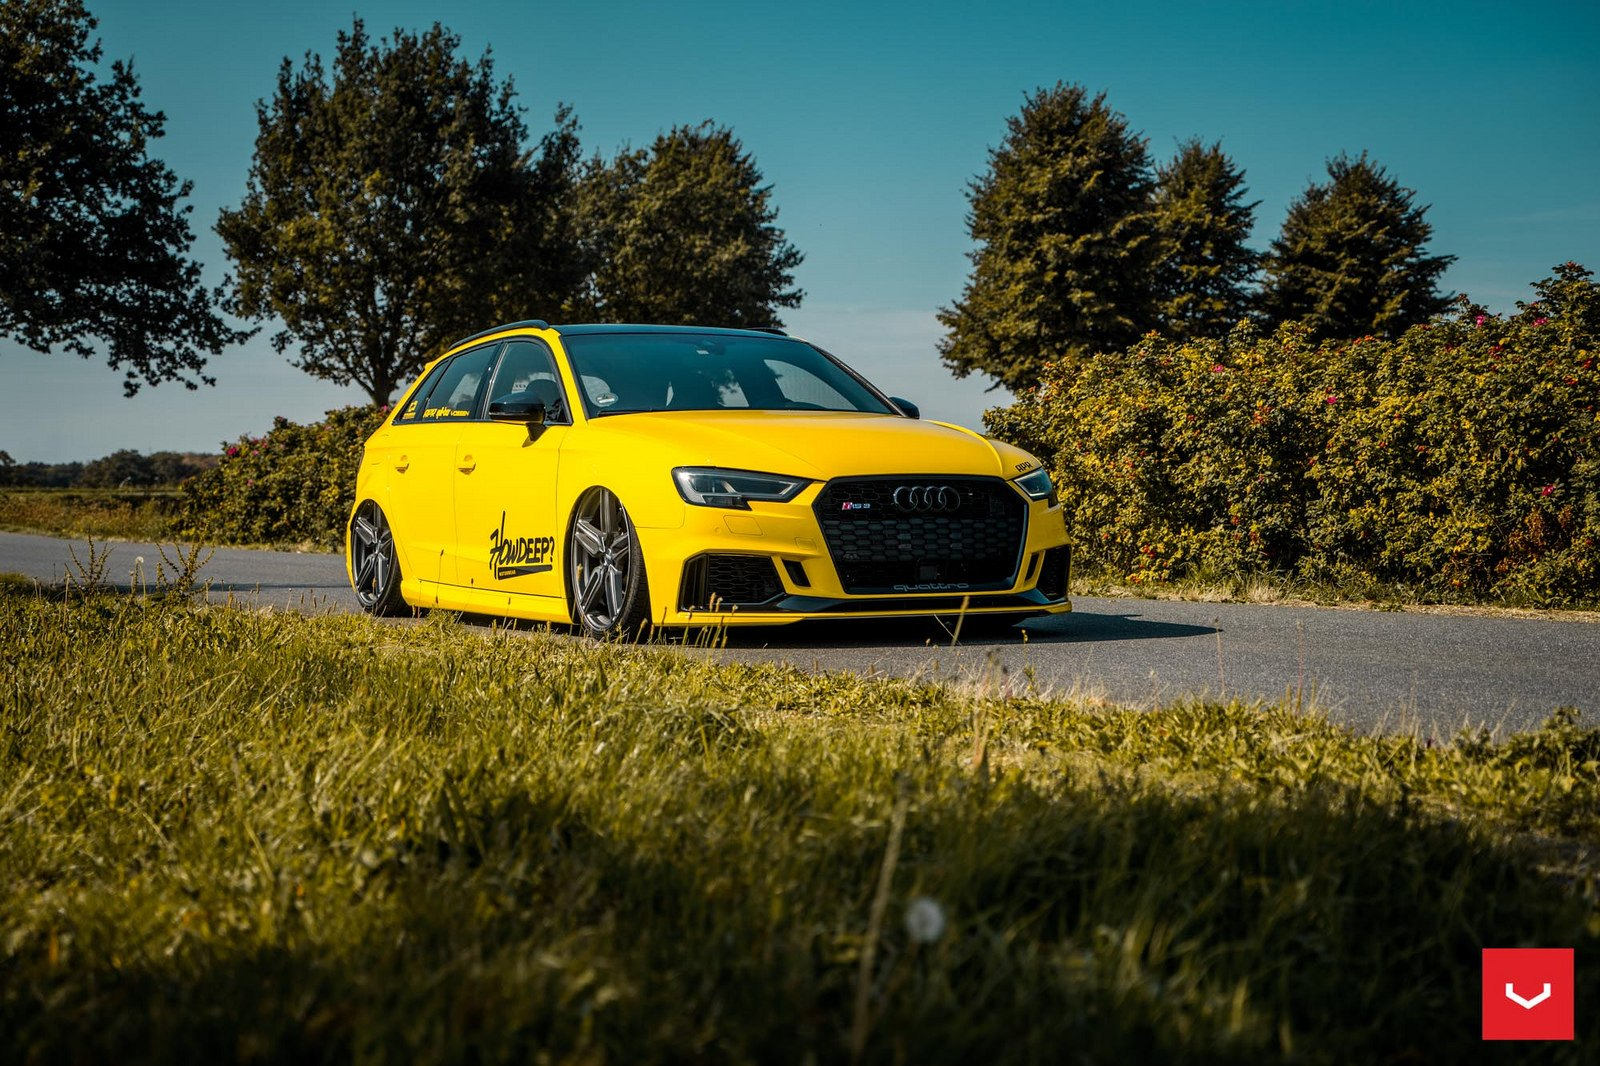 Custom Audi S3 Images Mods Photos Upgrades Carid Com Gallery